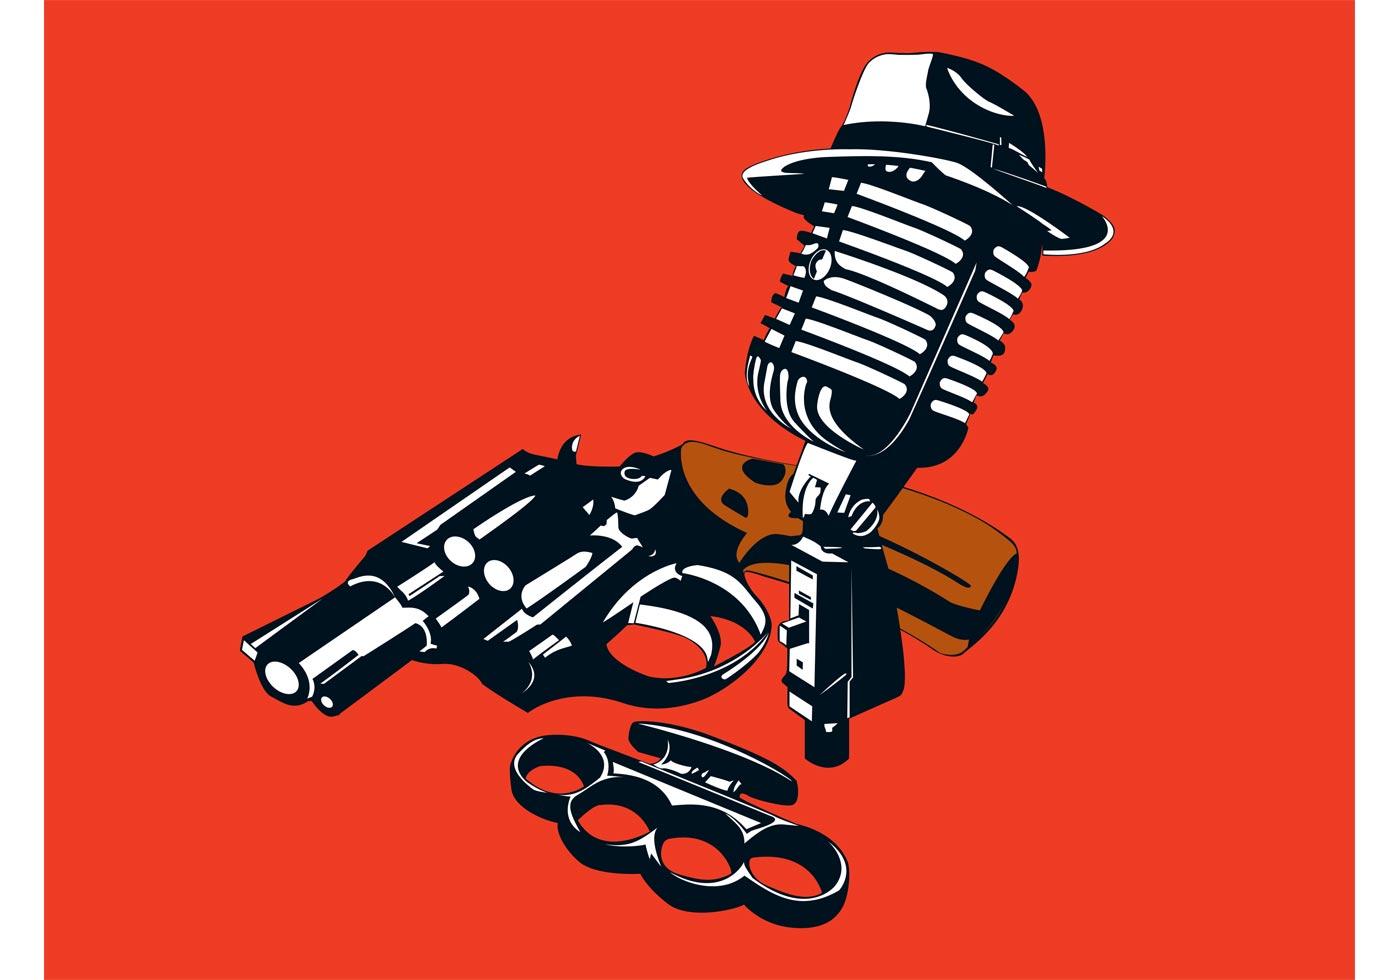 Retro Gangster Design - Download Free Vector Art, Stock ...Gangsta Artwork